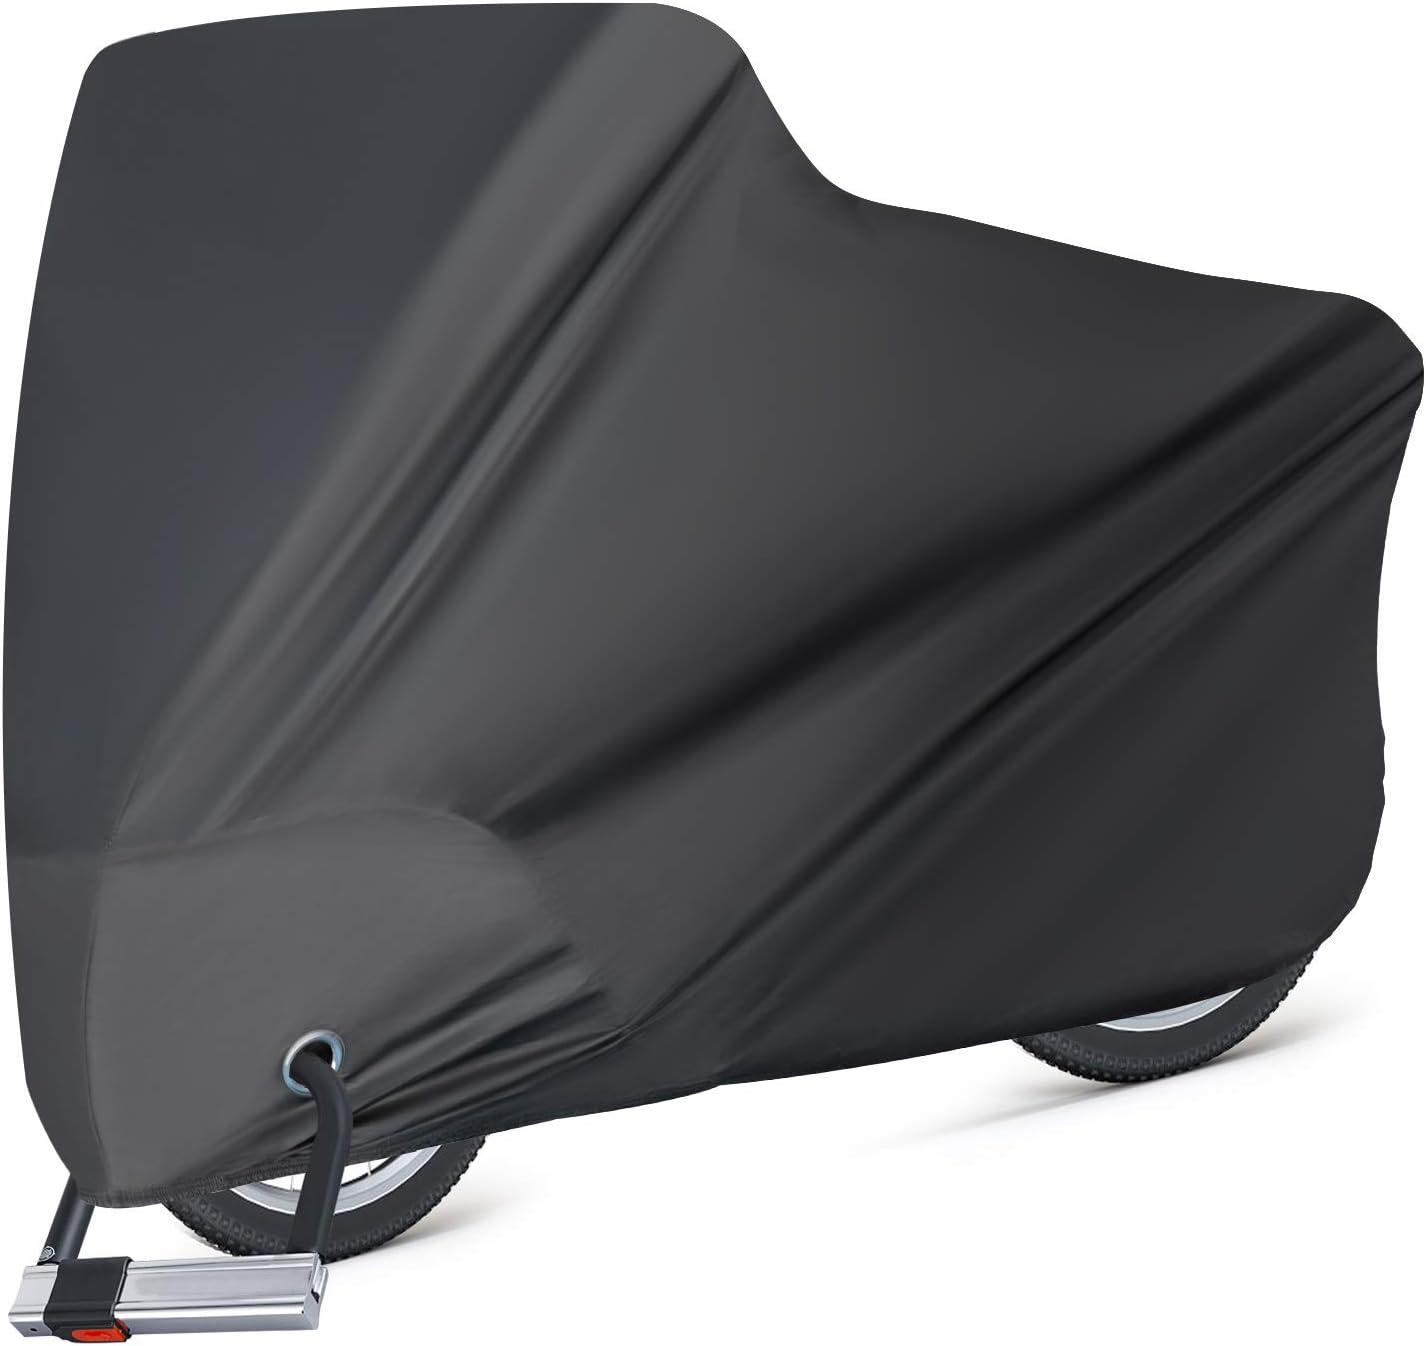 XL Waterproof Bicycle Cover Bike Sun Rain Dust Protector Garage Outdoor NEW US